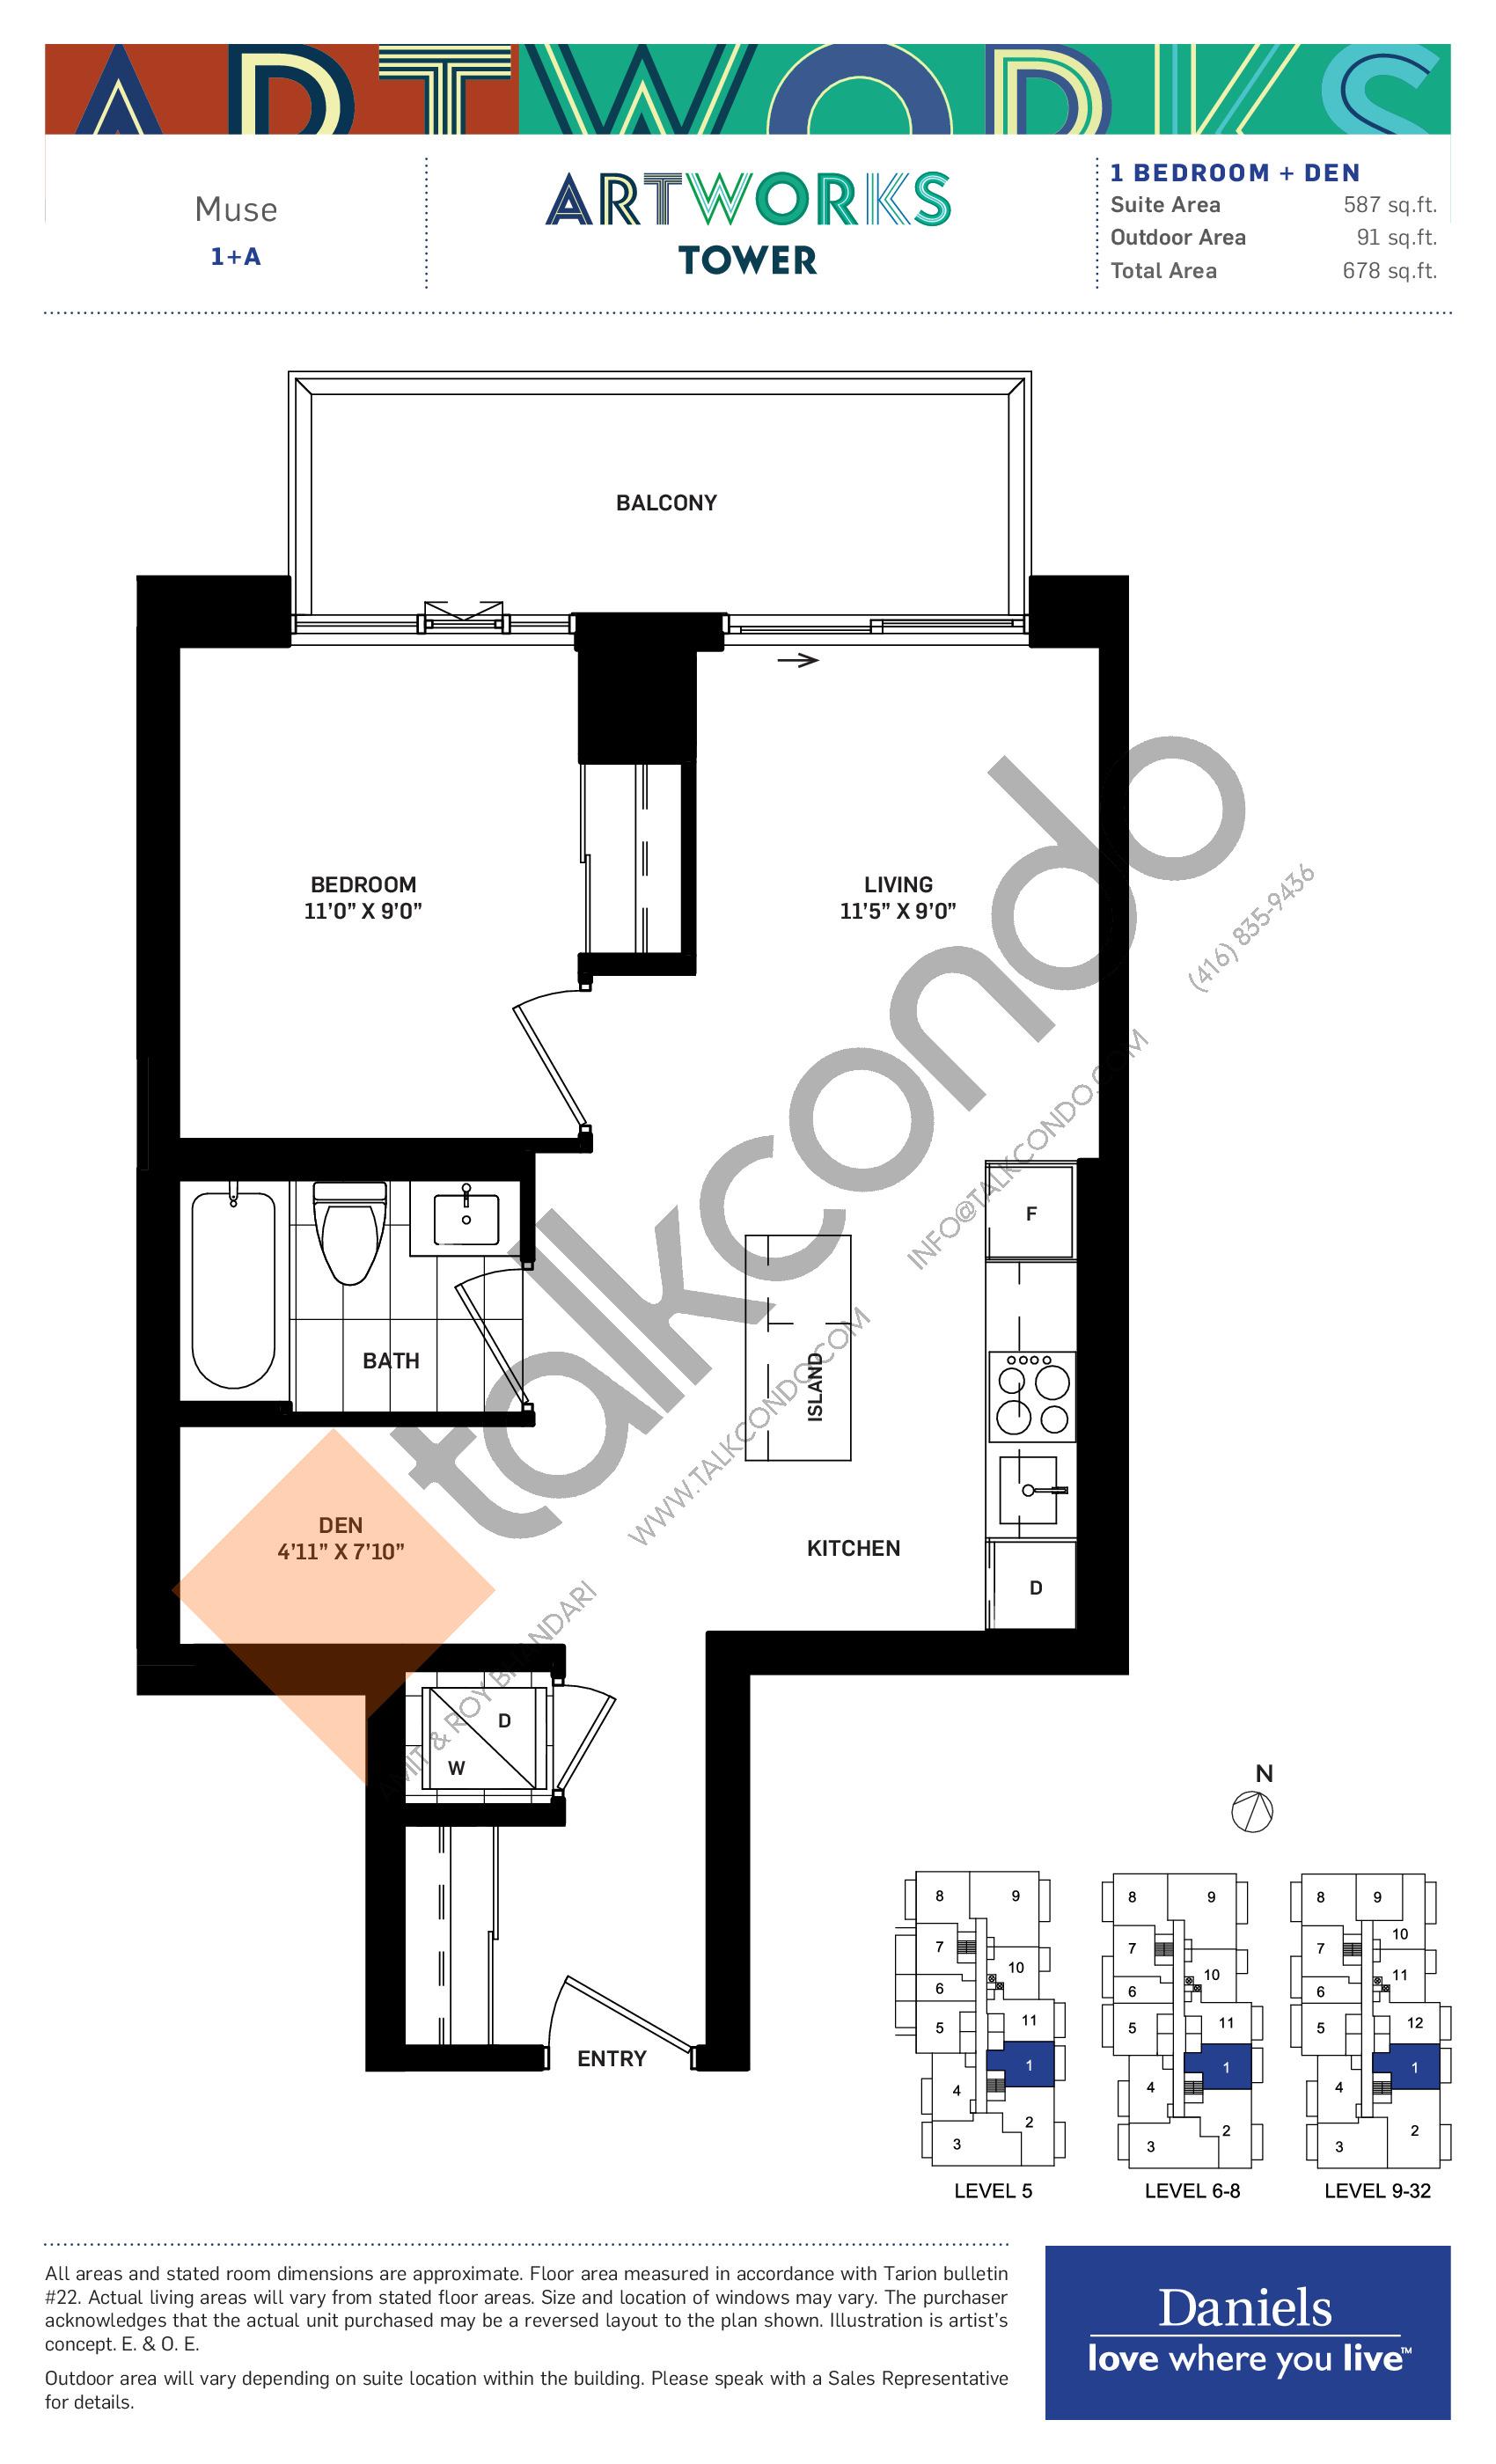 Muse Floor Plan at Artworks Tower Condos - 587 sq.ft